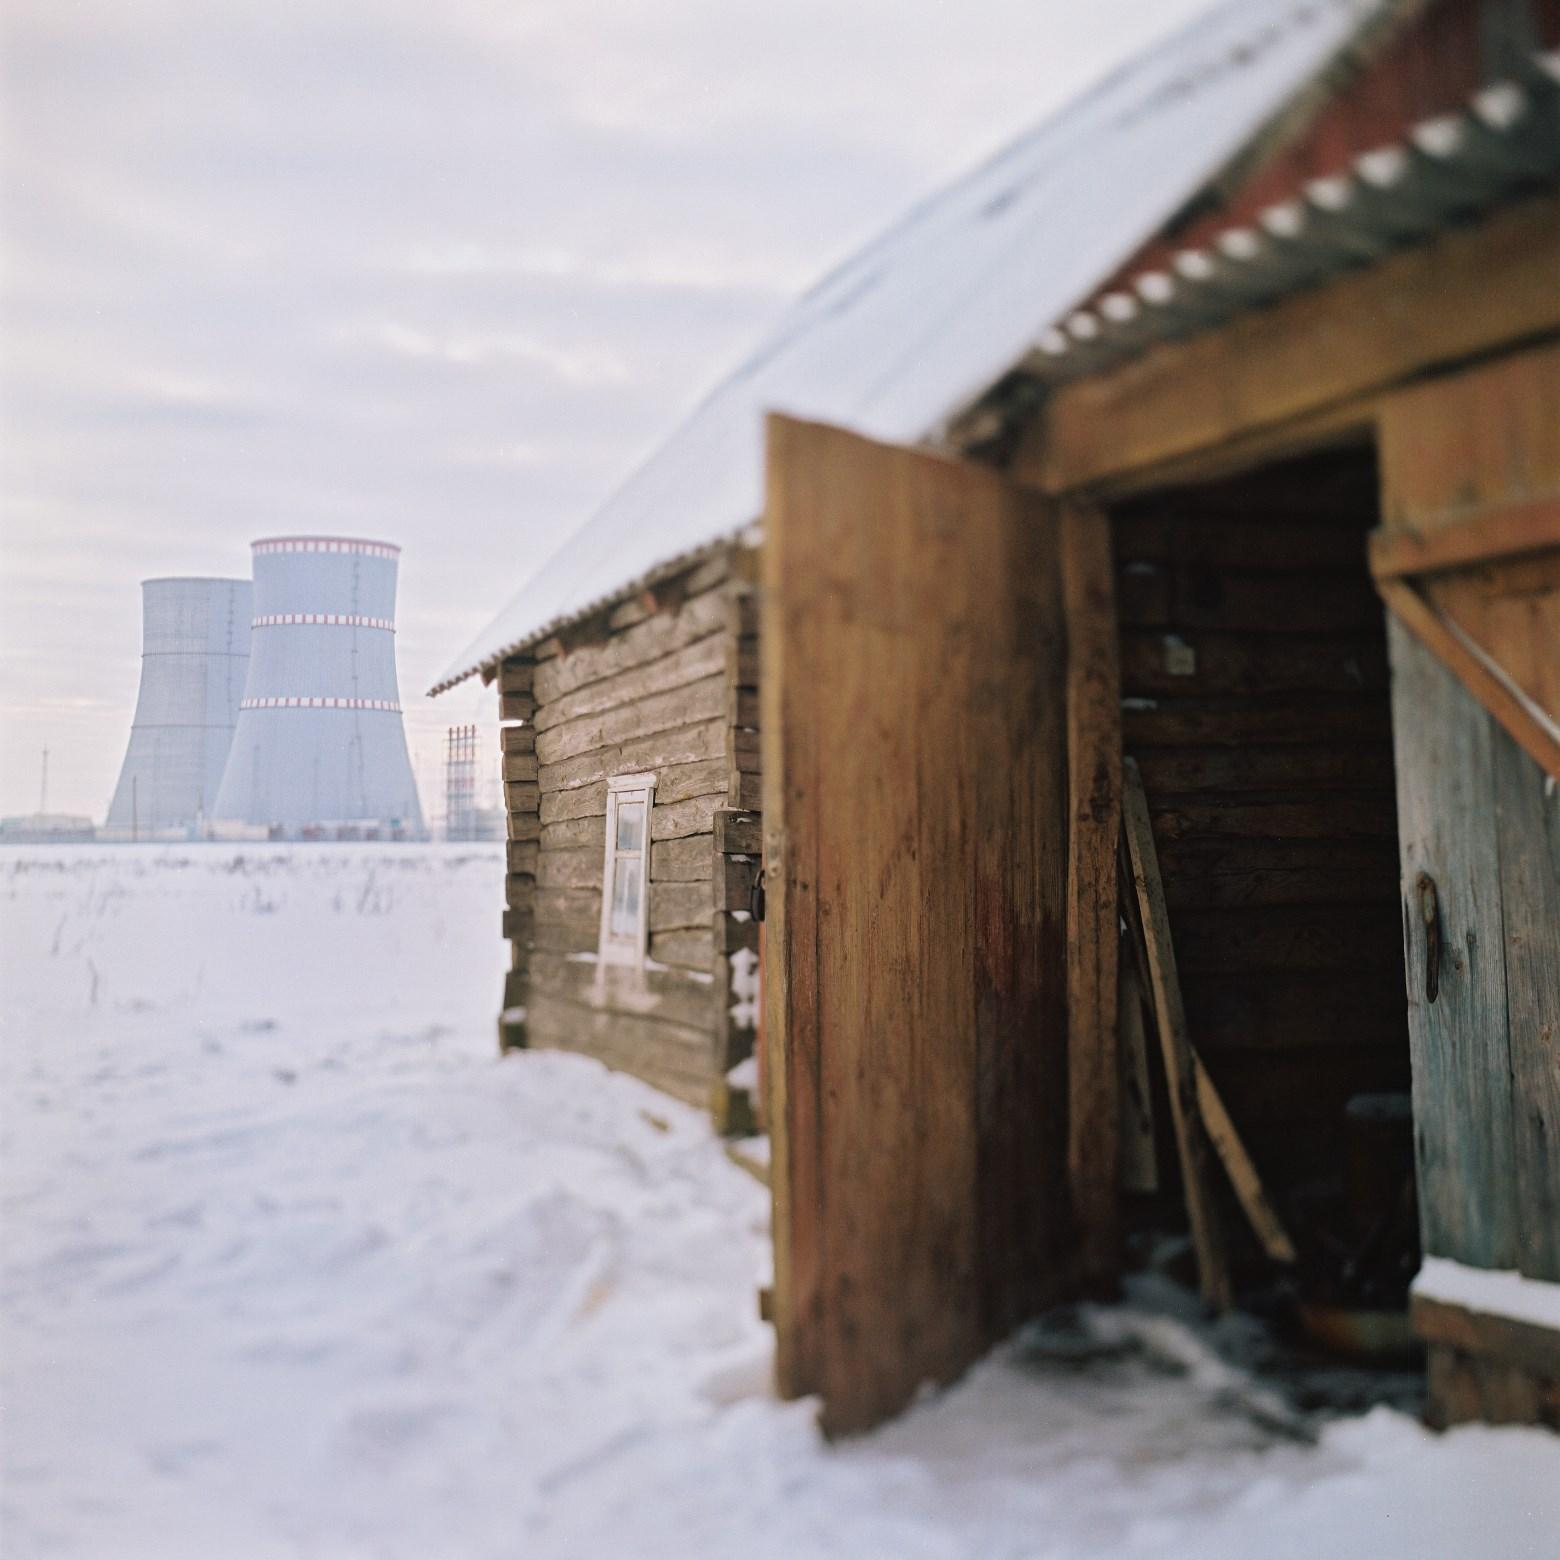 БелАЭС, репортаж. фото Максим Шумилин